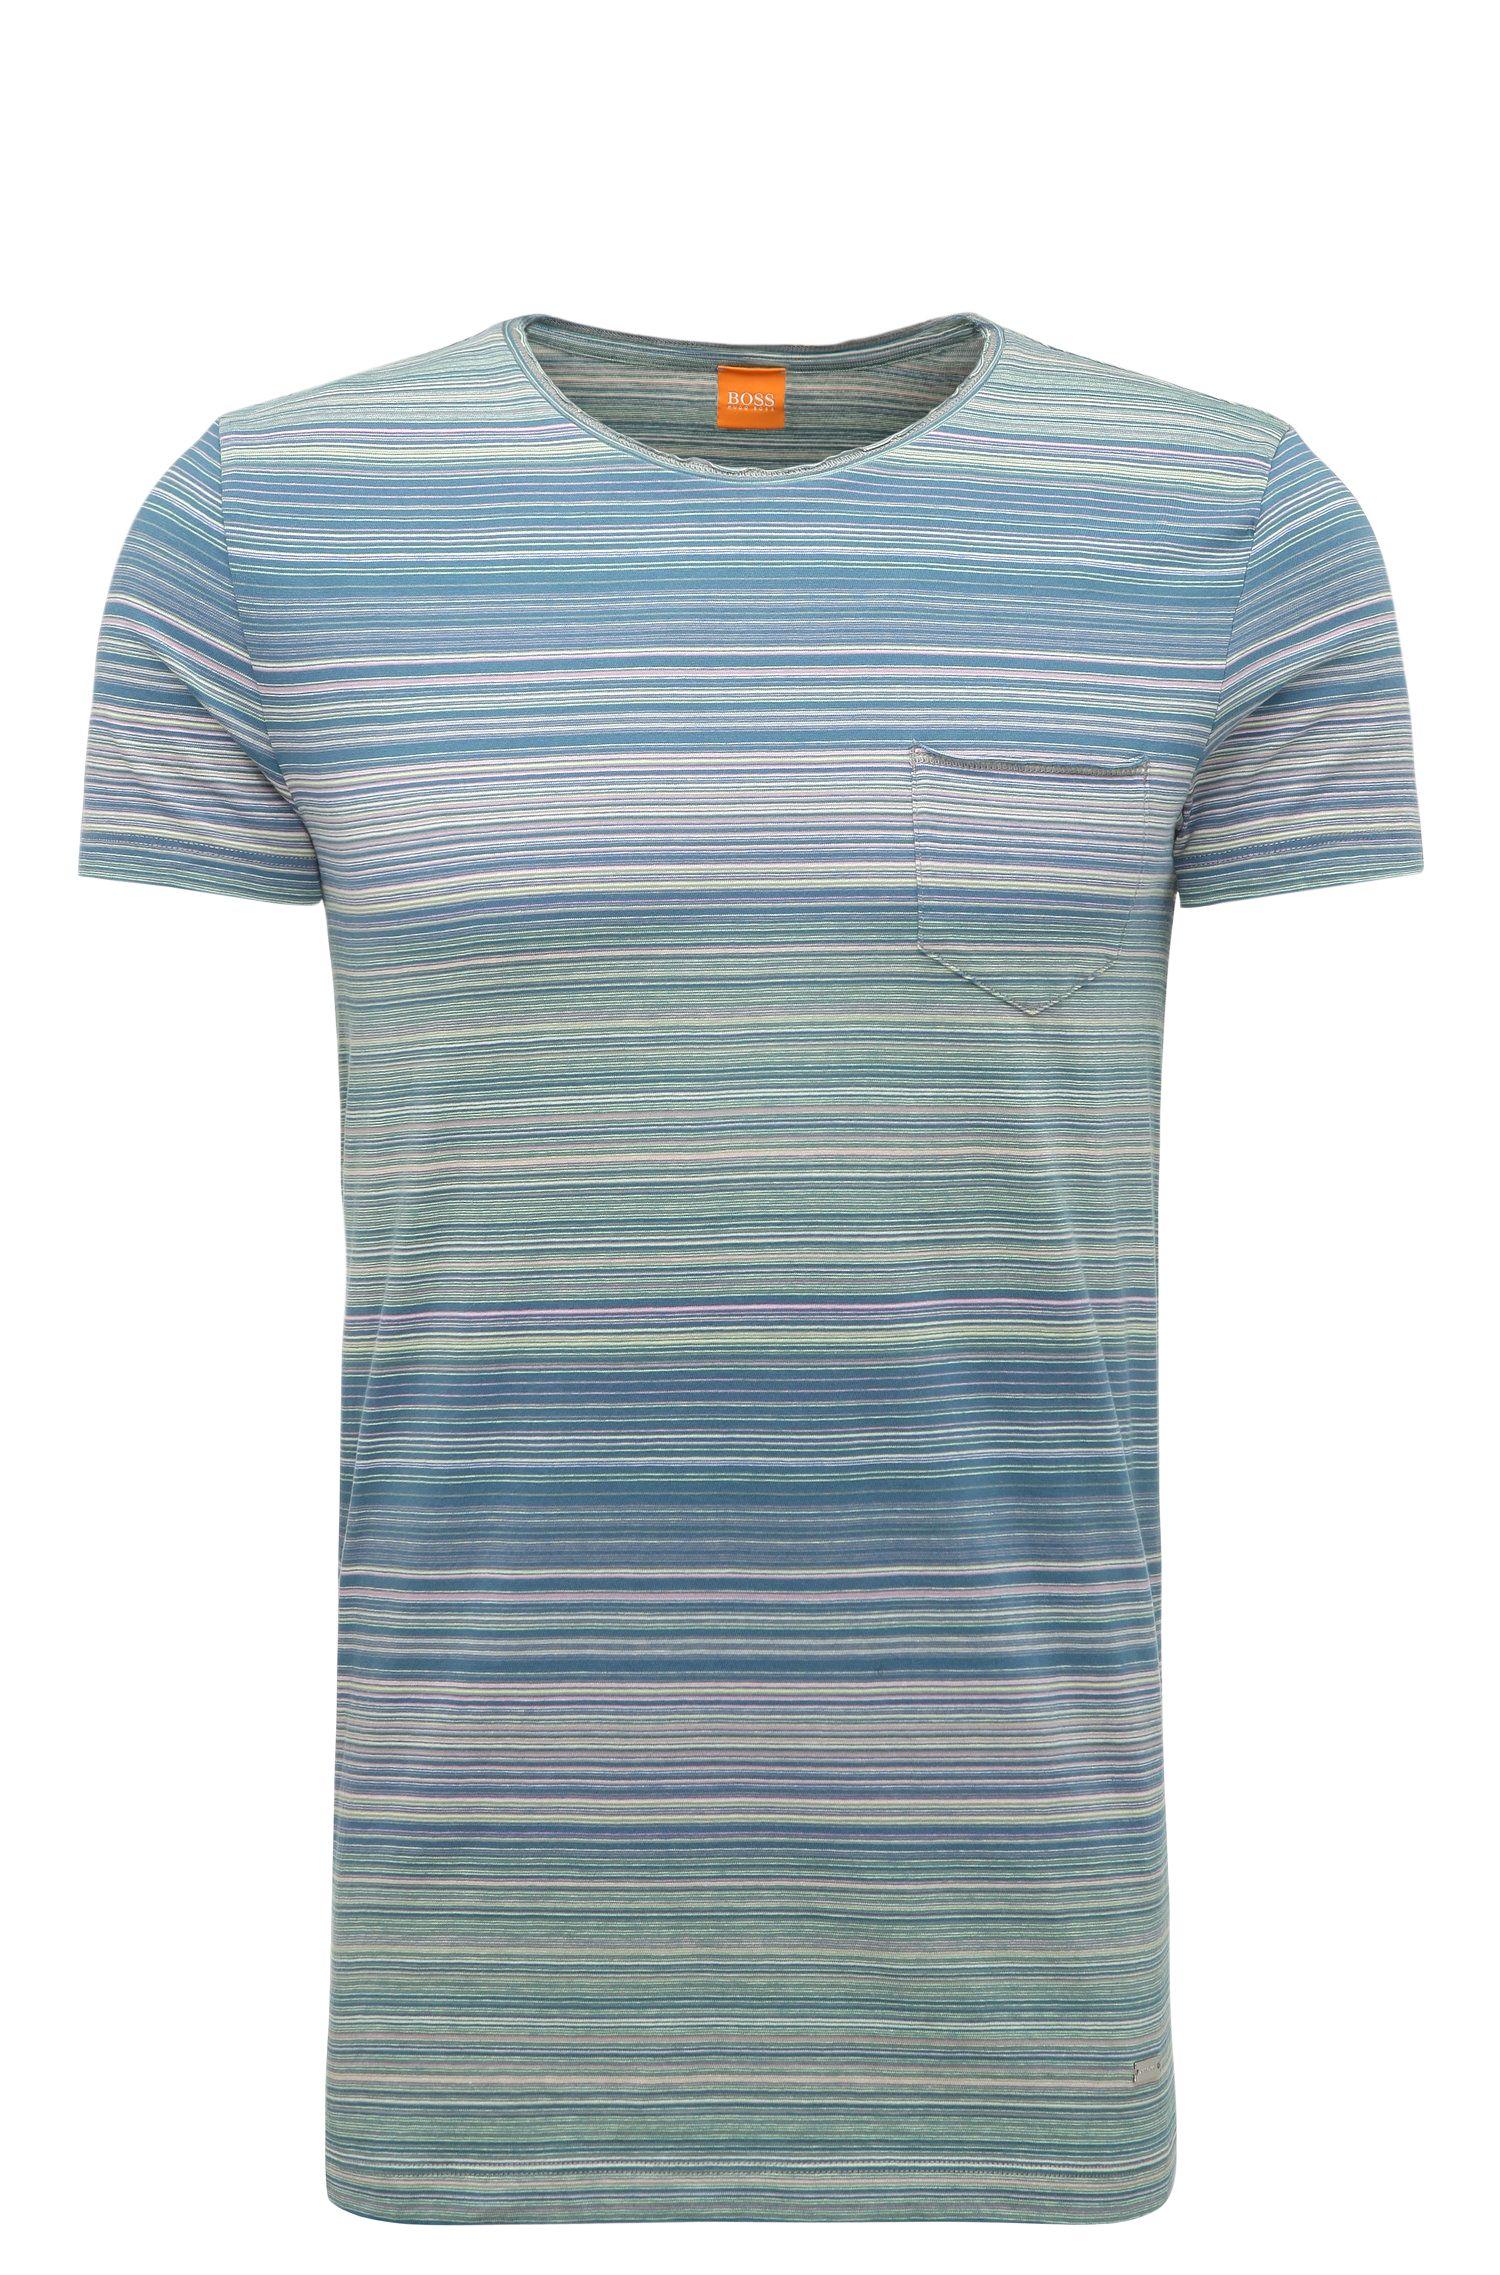 'Tedryk' | Slim-Fit Striped Cotton T-Shirt